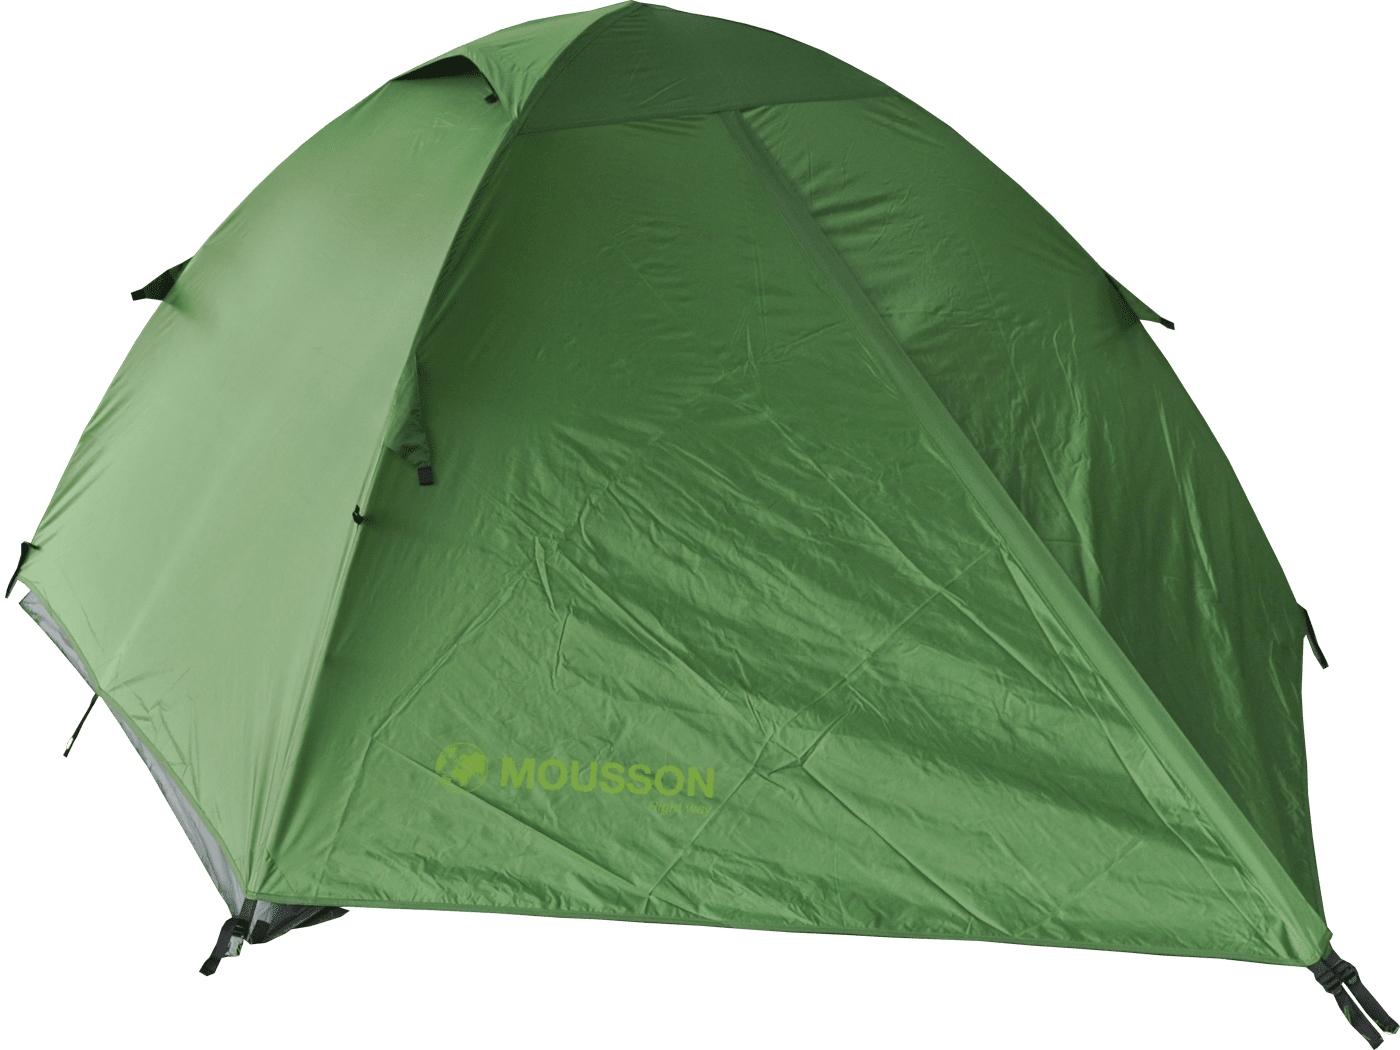 ≡ Намет MOUSSON FLY 2 GREEN – купити в Києві  489af1c3b9ed4